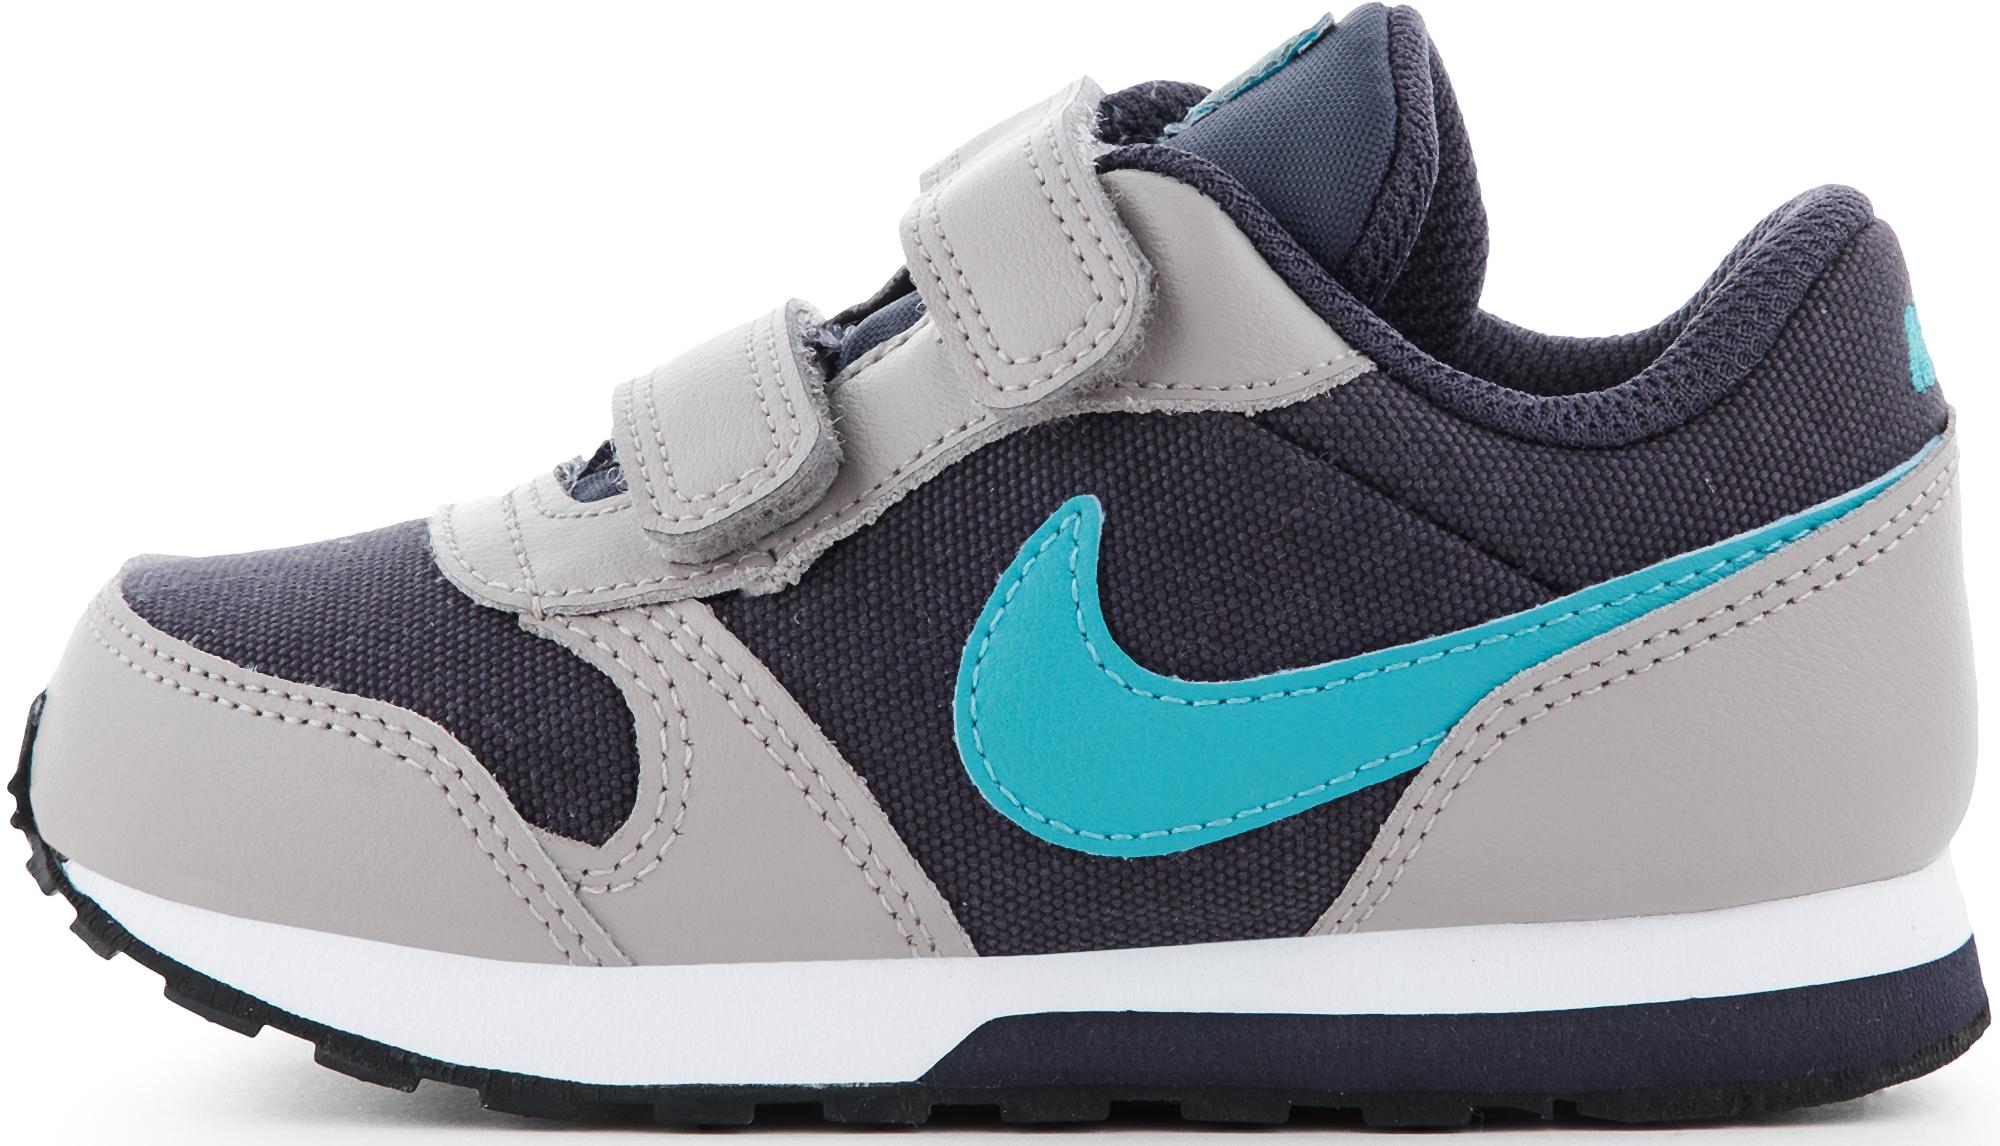 Nike Кроссовки для мальчиков Nike MD Runner 2, размер 26 nike кроссовки для мальчиков nike lunar hayward размер 37 5